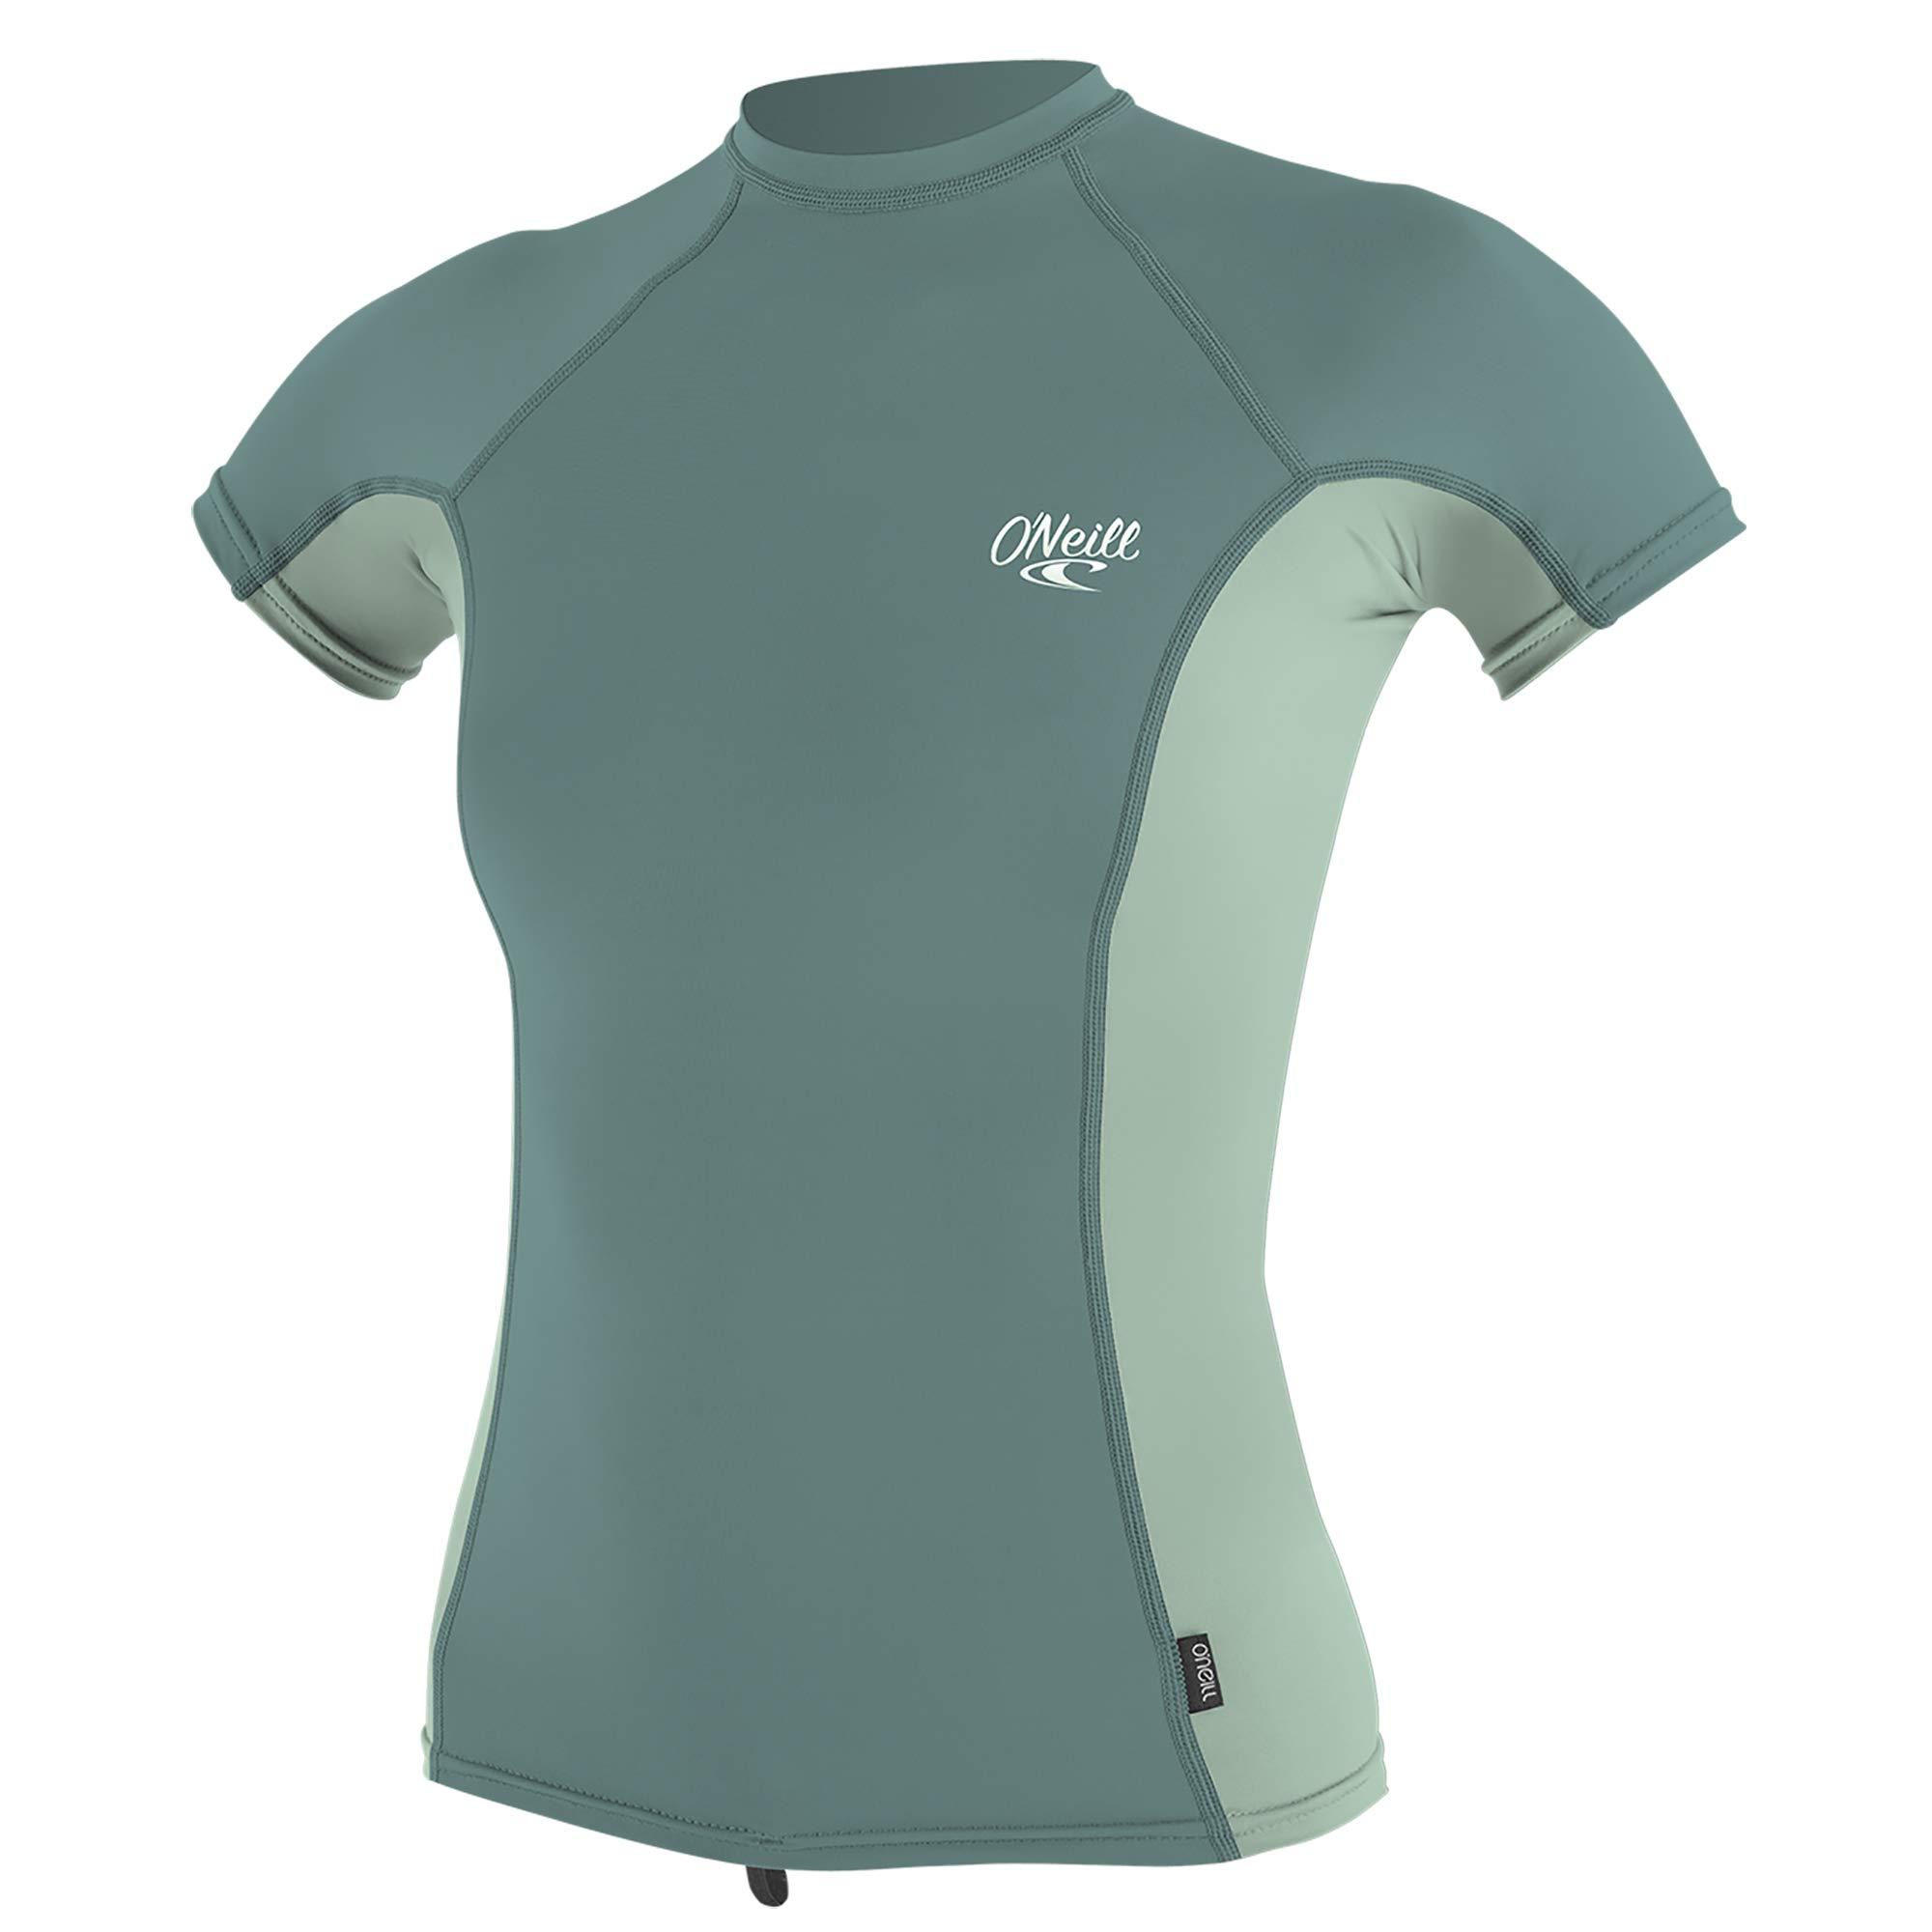 O'Neill Wetsuits Women's Premium Skins UPF 50+ Rash Guard, Eucalyptus/Fresh Mint, X-Large by O'Neill Wetsuits